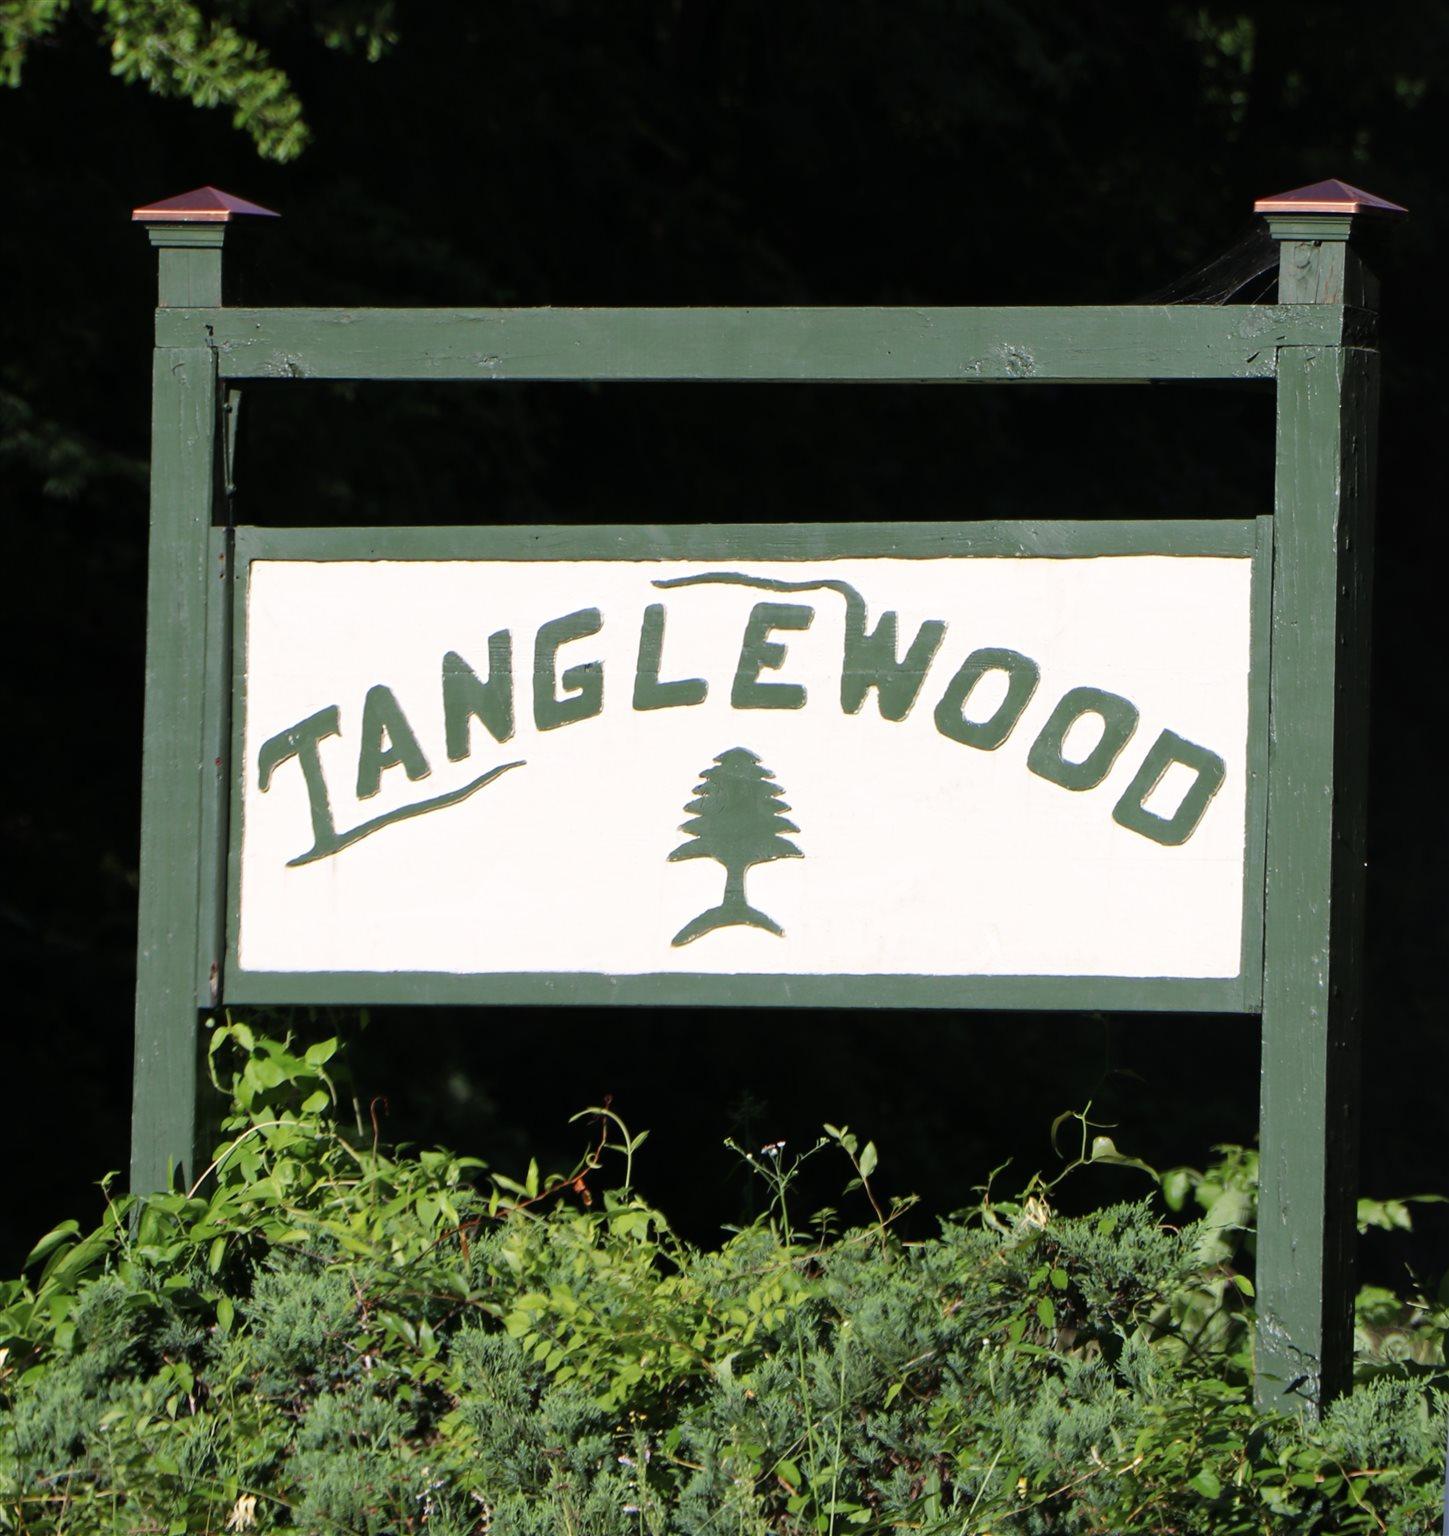 0 SW TANGLEWOOD DRIVE PL, Lake Sinclair, Georgia